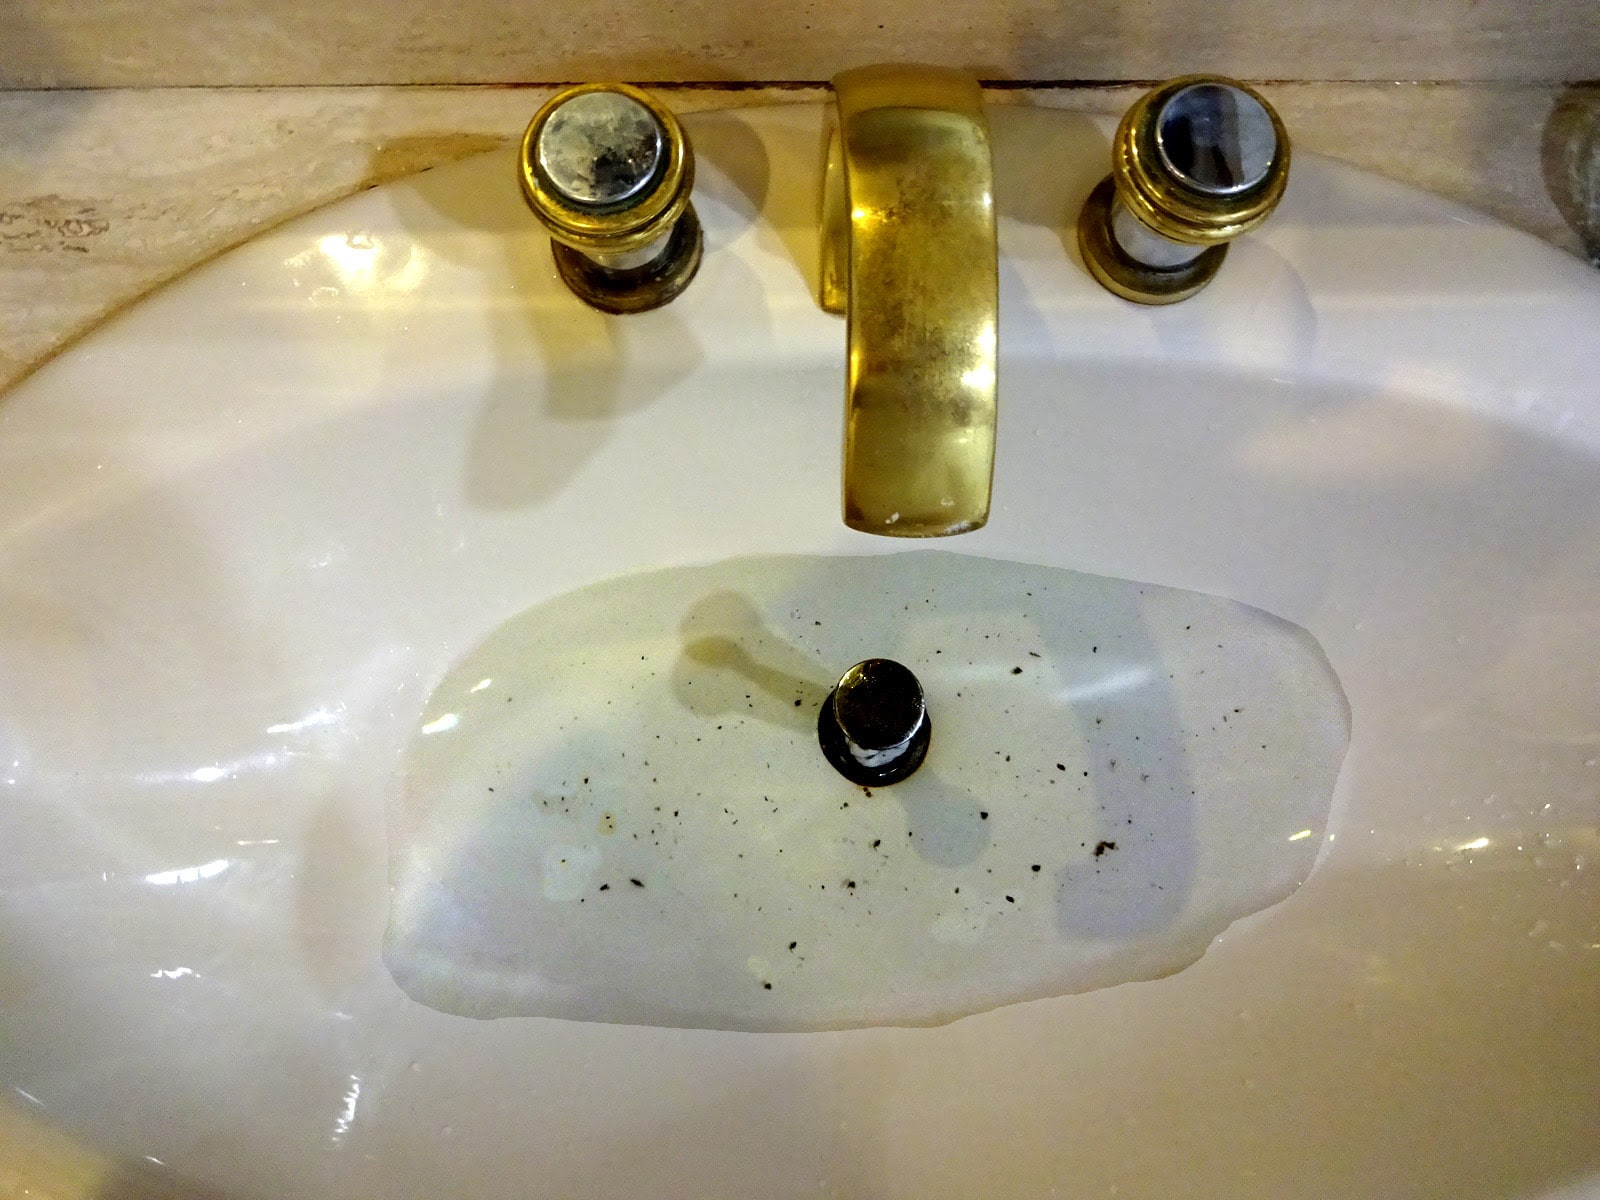 Bathroom Remodels Inspirational Bathroom Sink Clogged